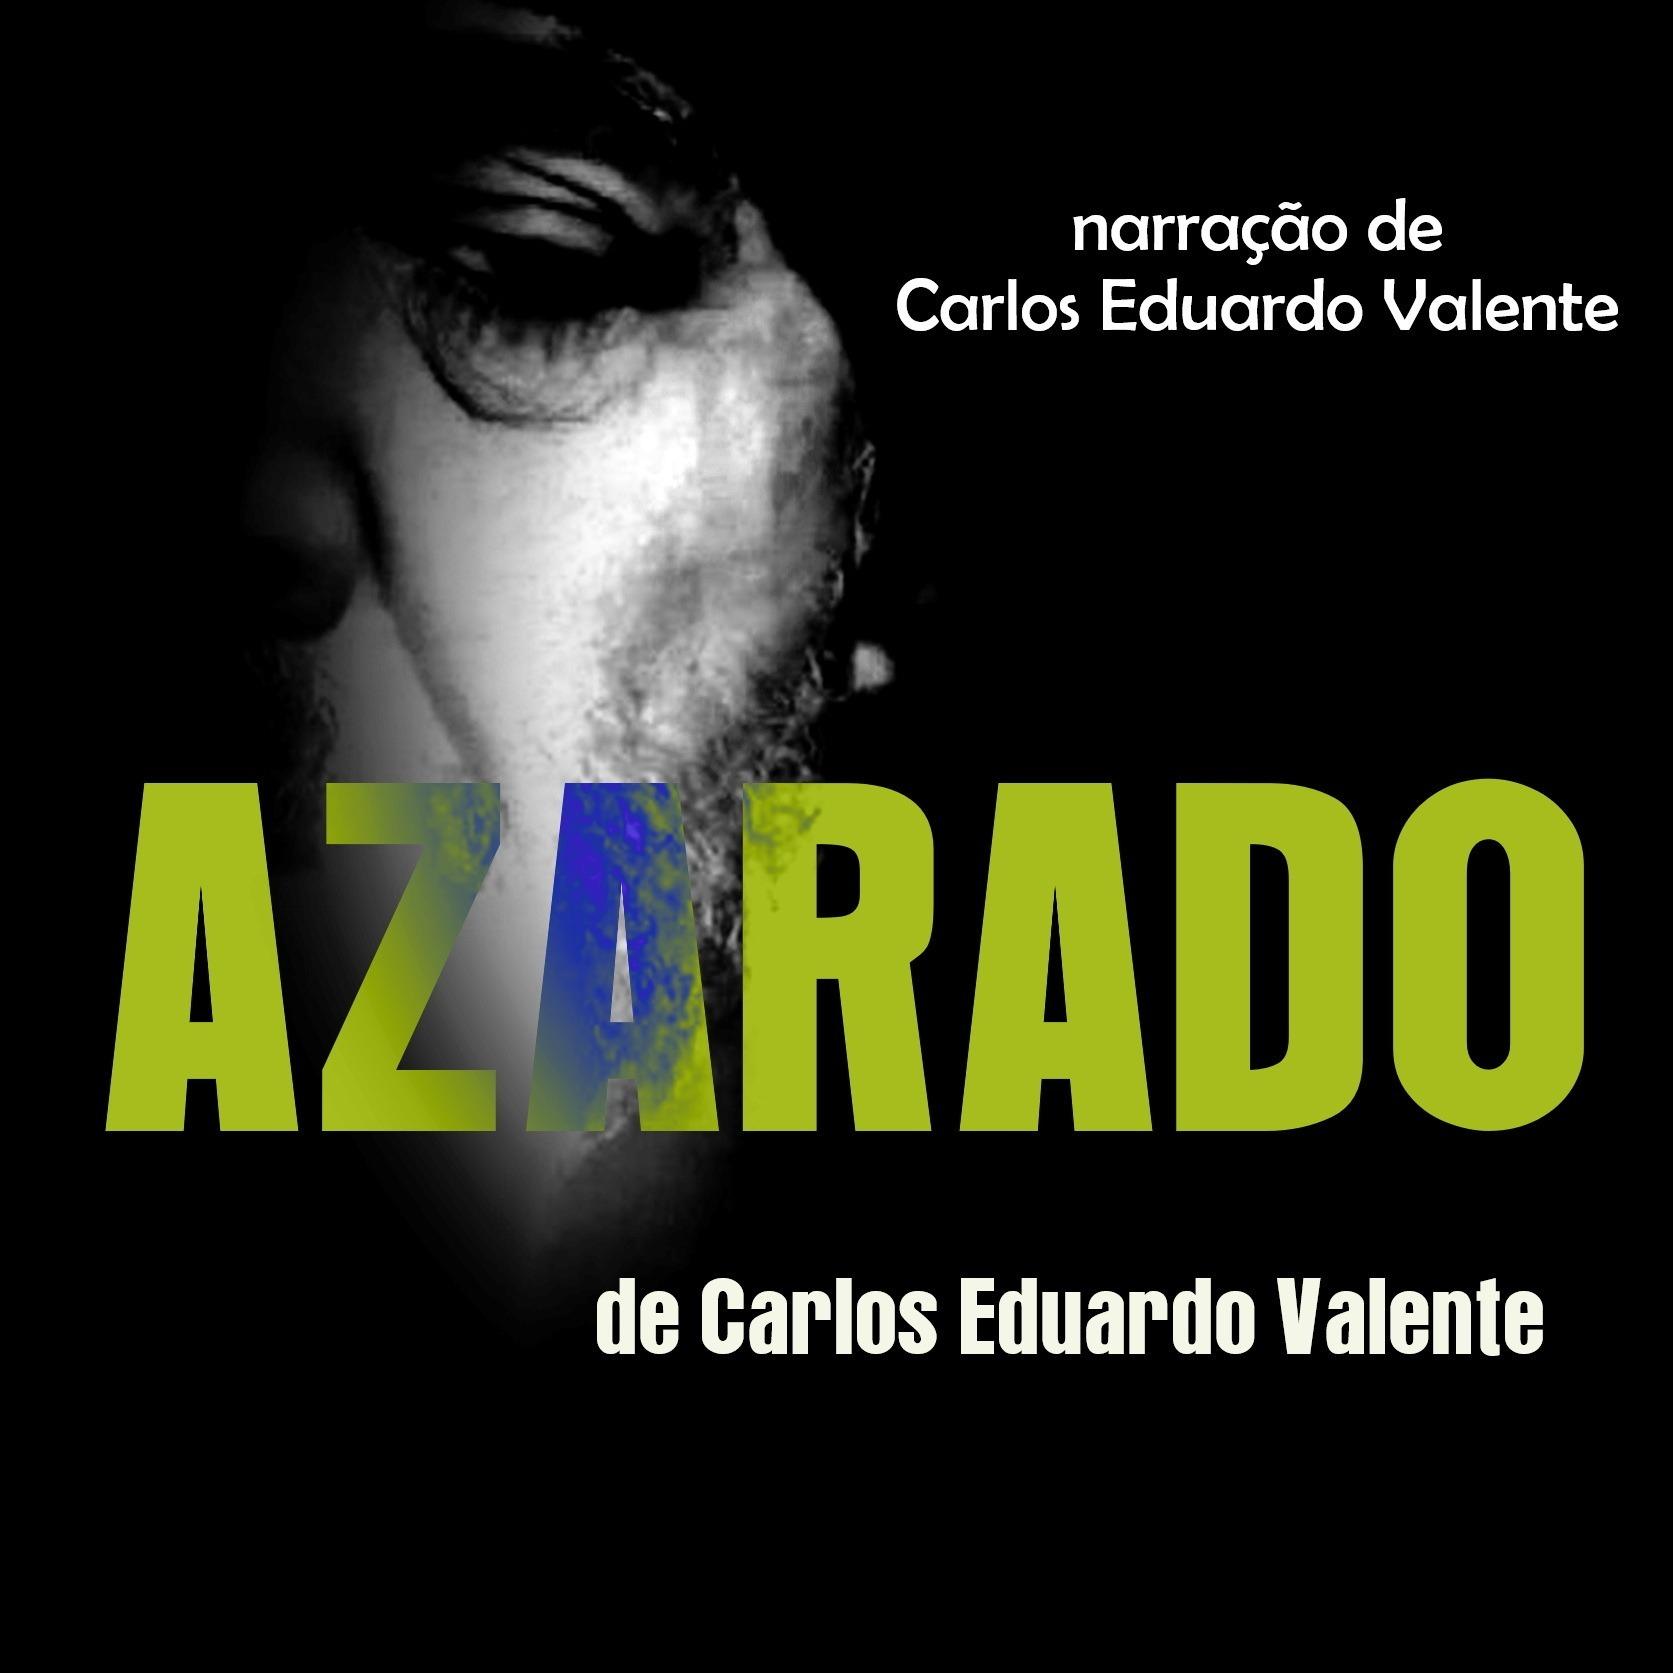 AZARADO  - de Carlos Eduardo Valente